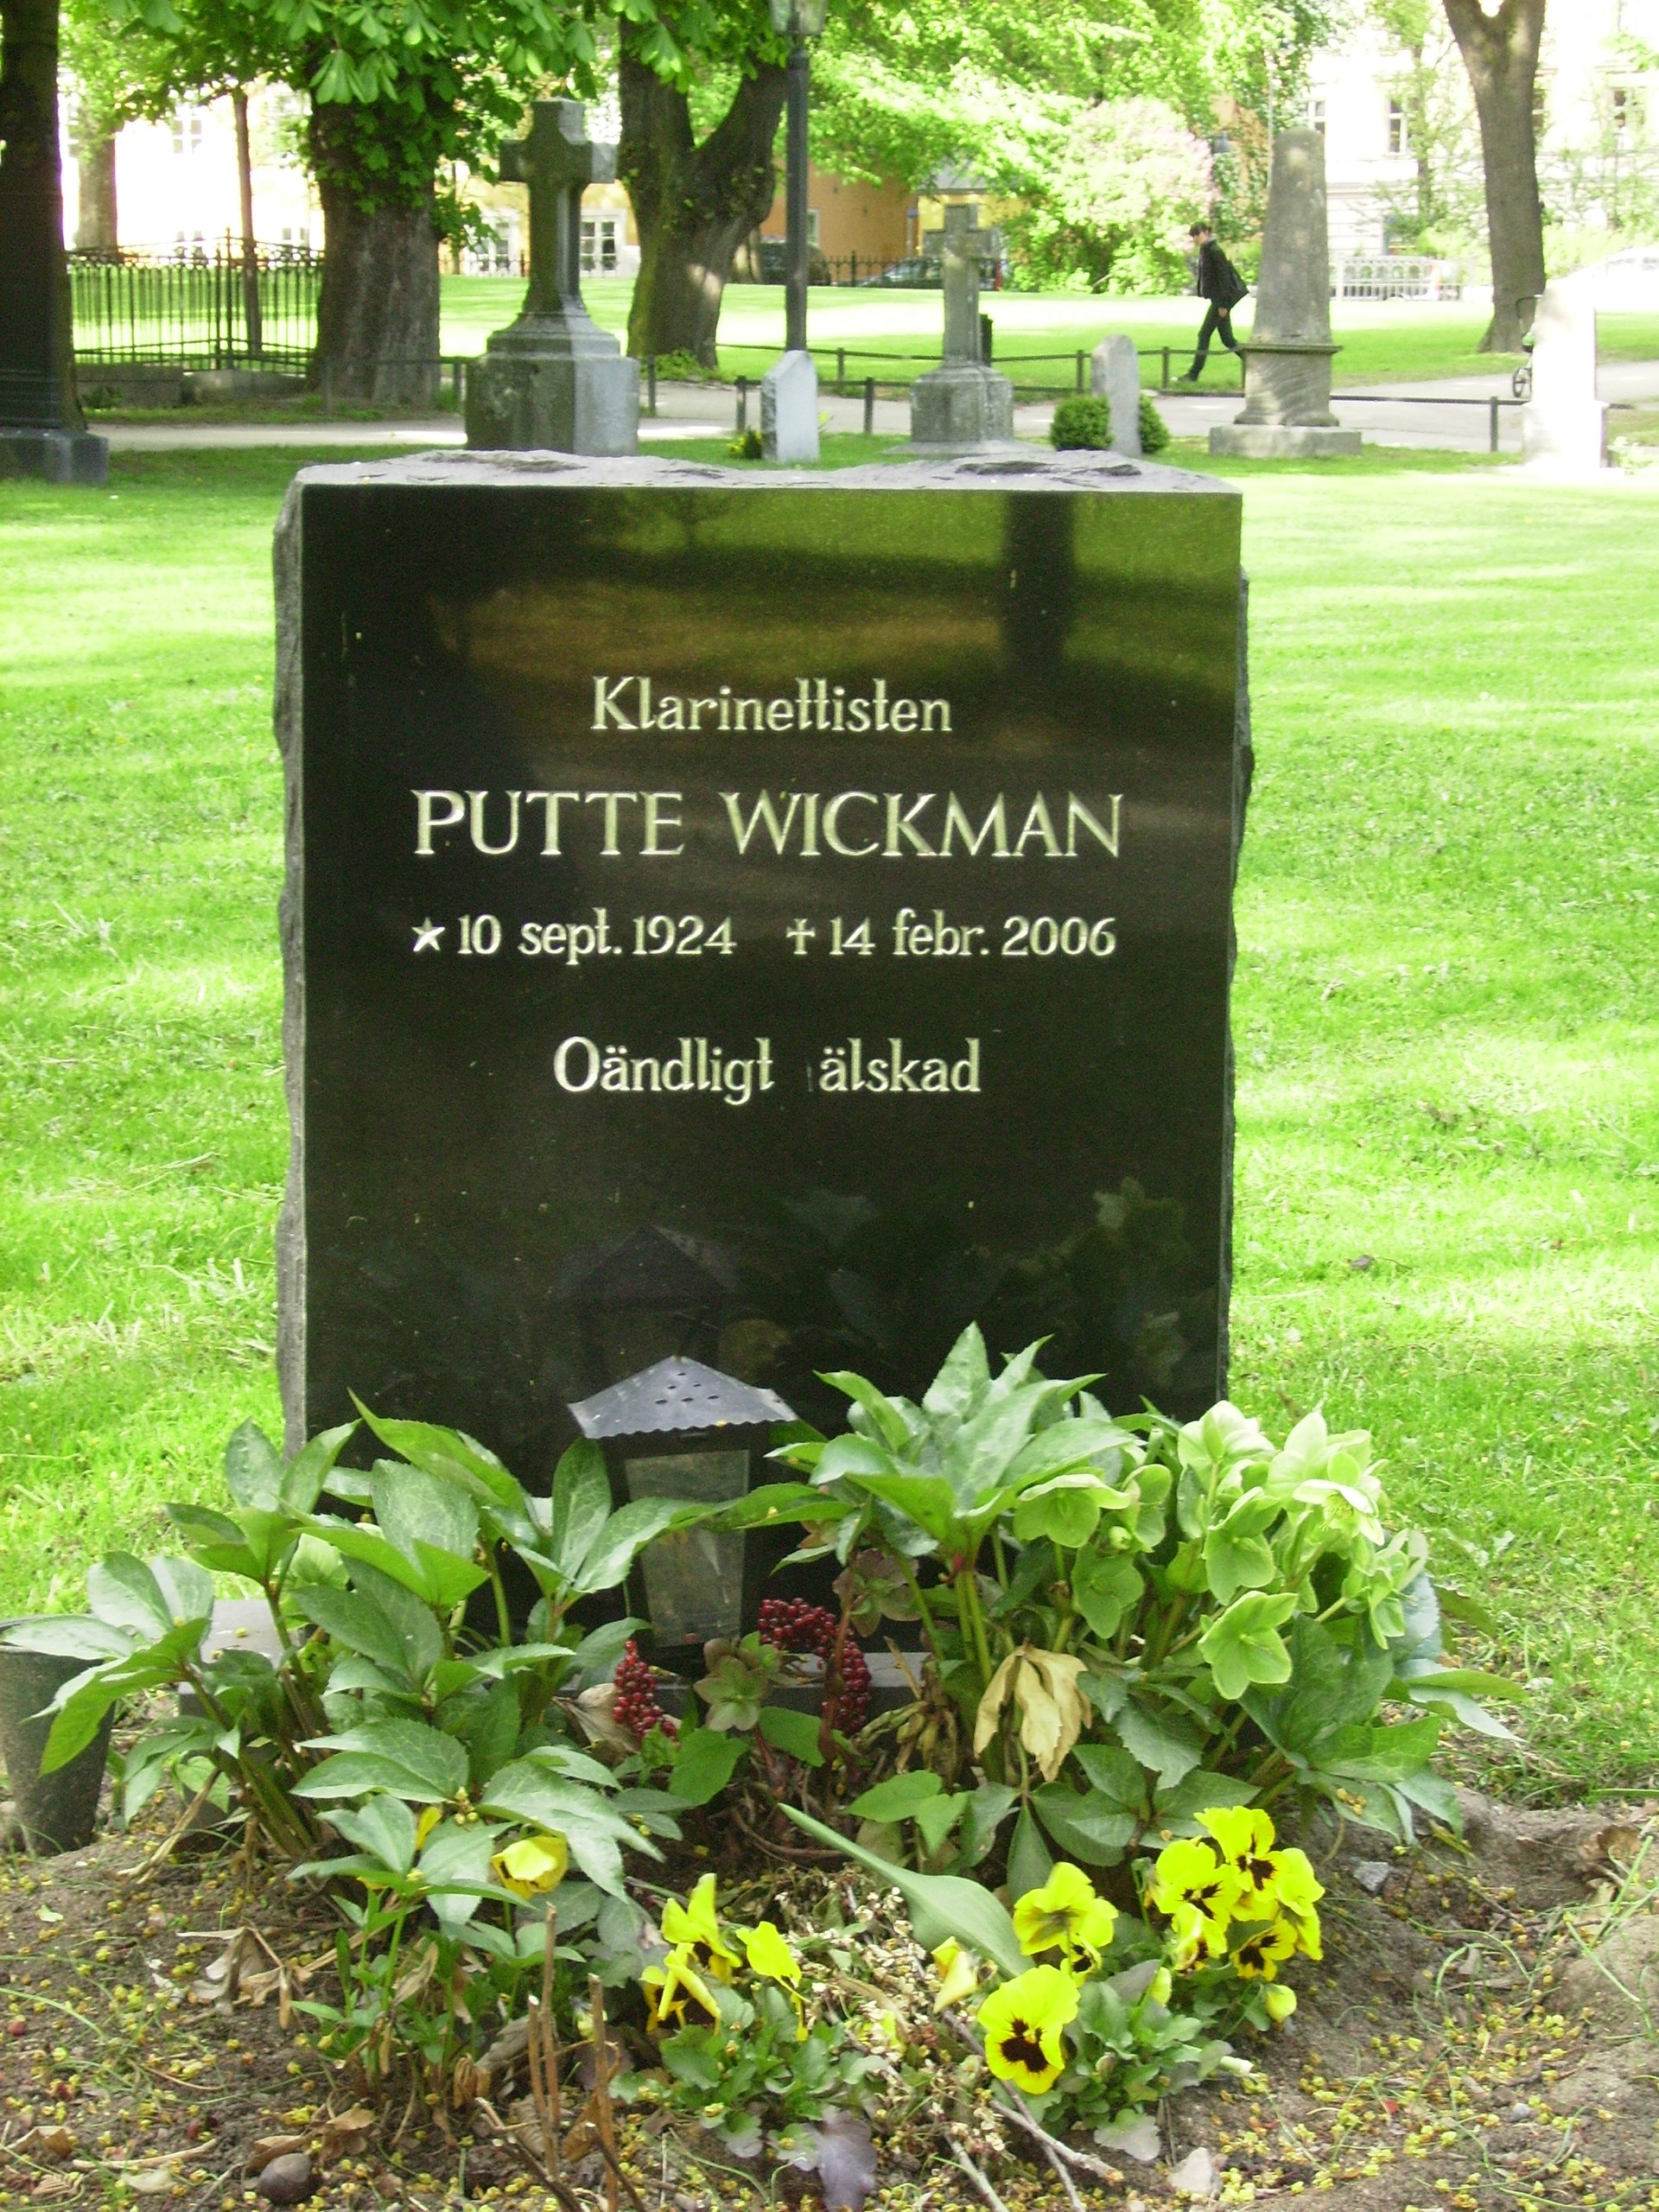 Putte Wickman net worth